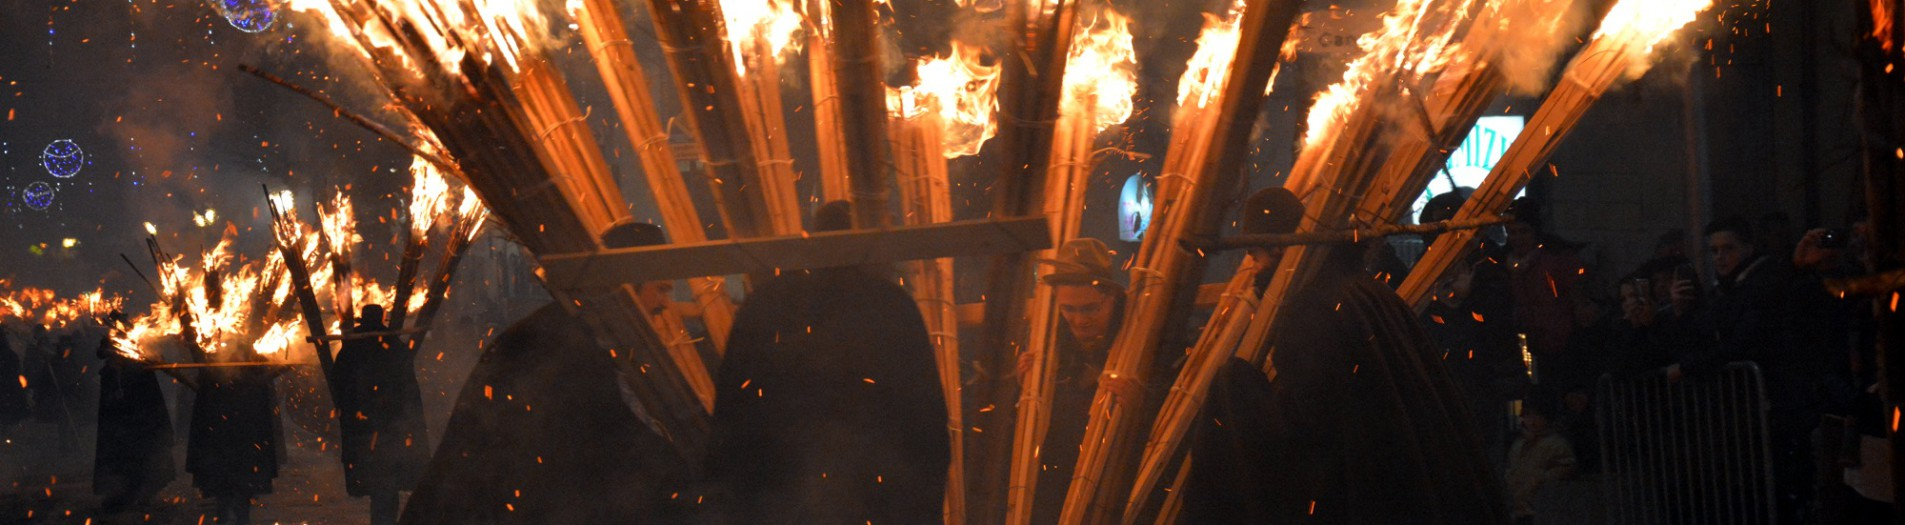 Bringing the fire: 'Ndocciata 2014